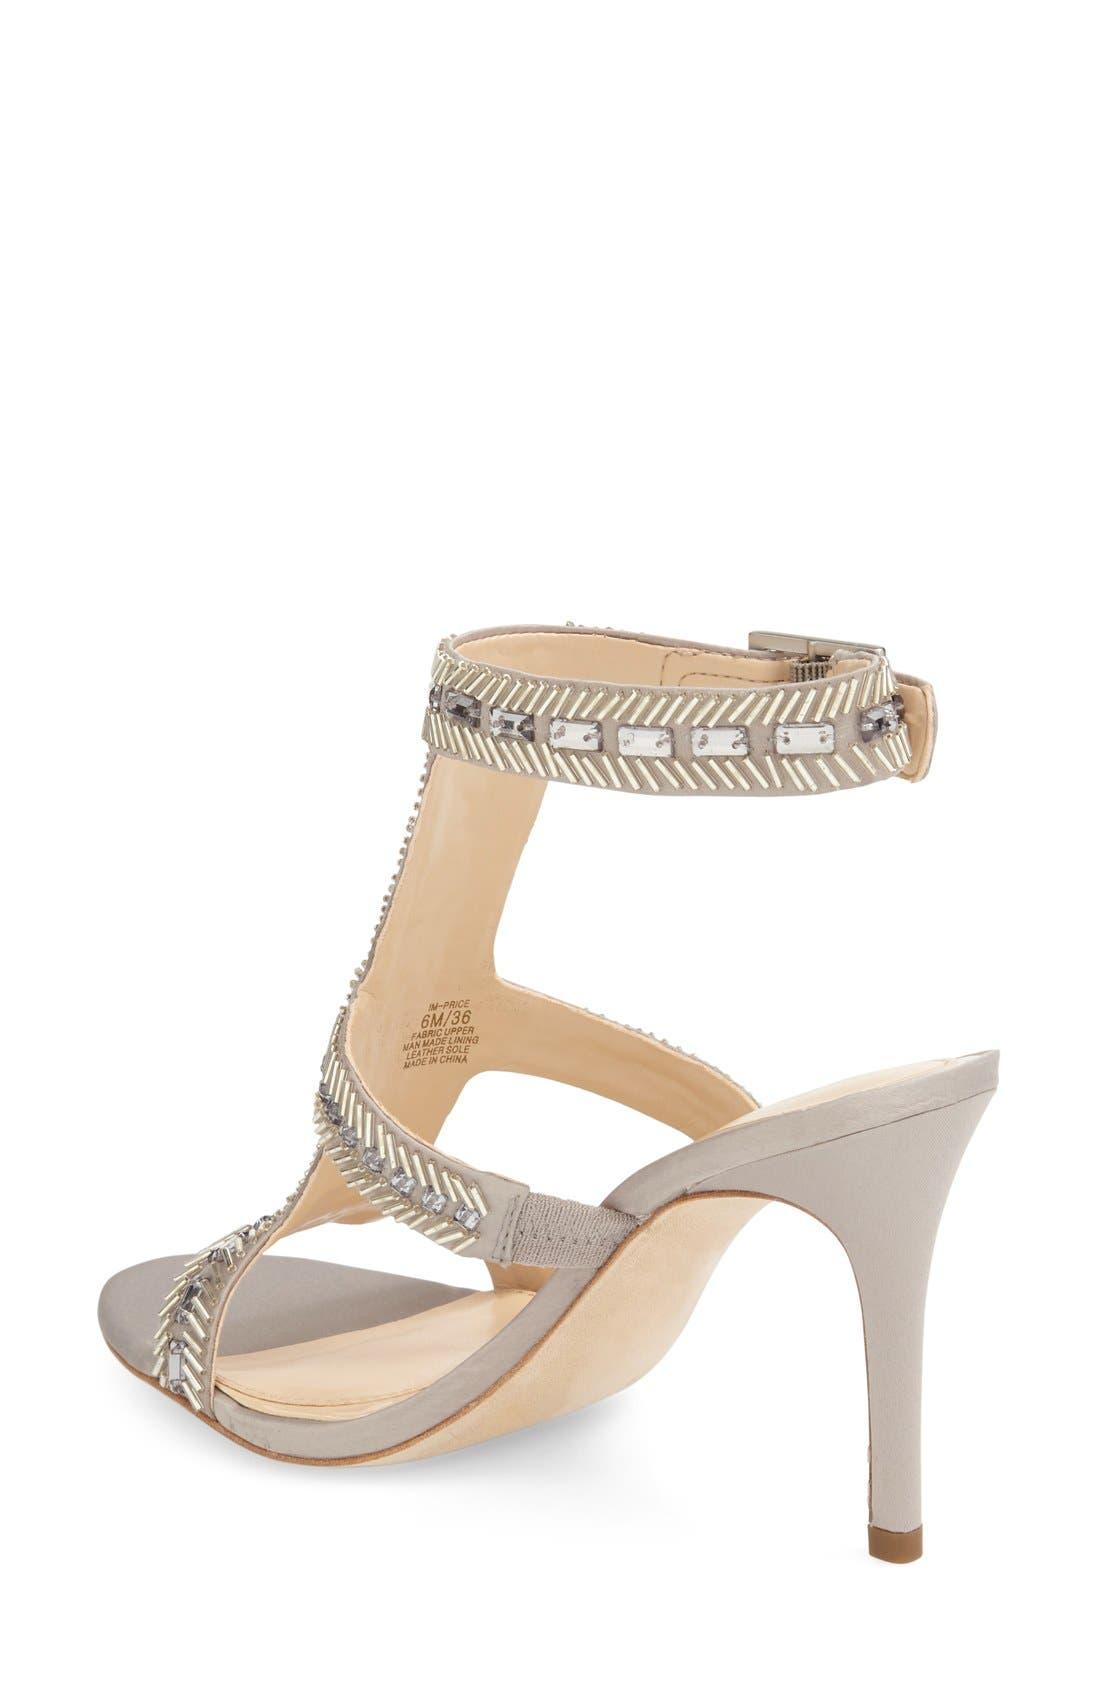 Alternate Image 2  - Imagine Vince Camuto 'Price' Beaded T-Strap Sandal (Women)